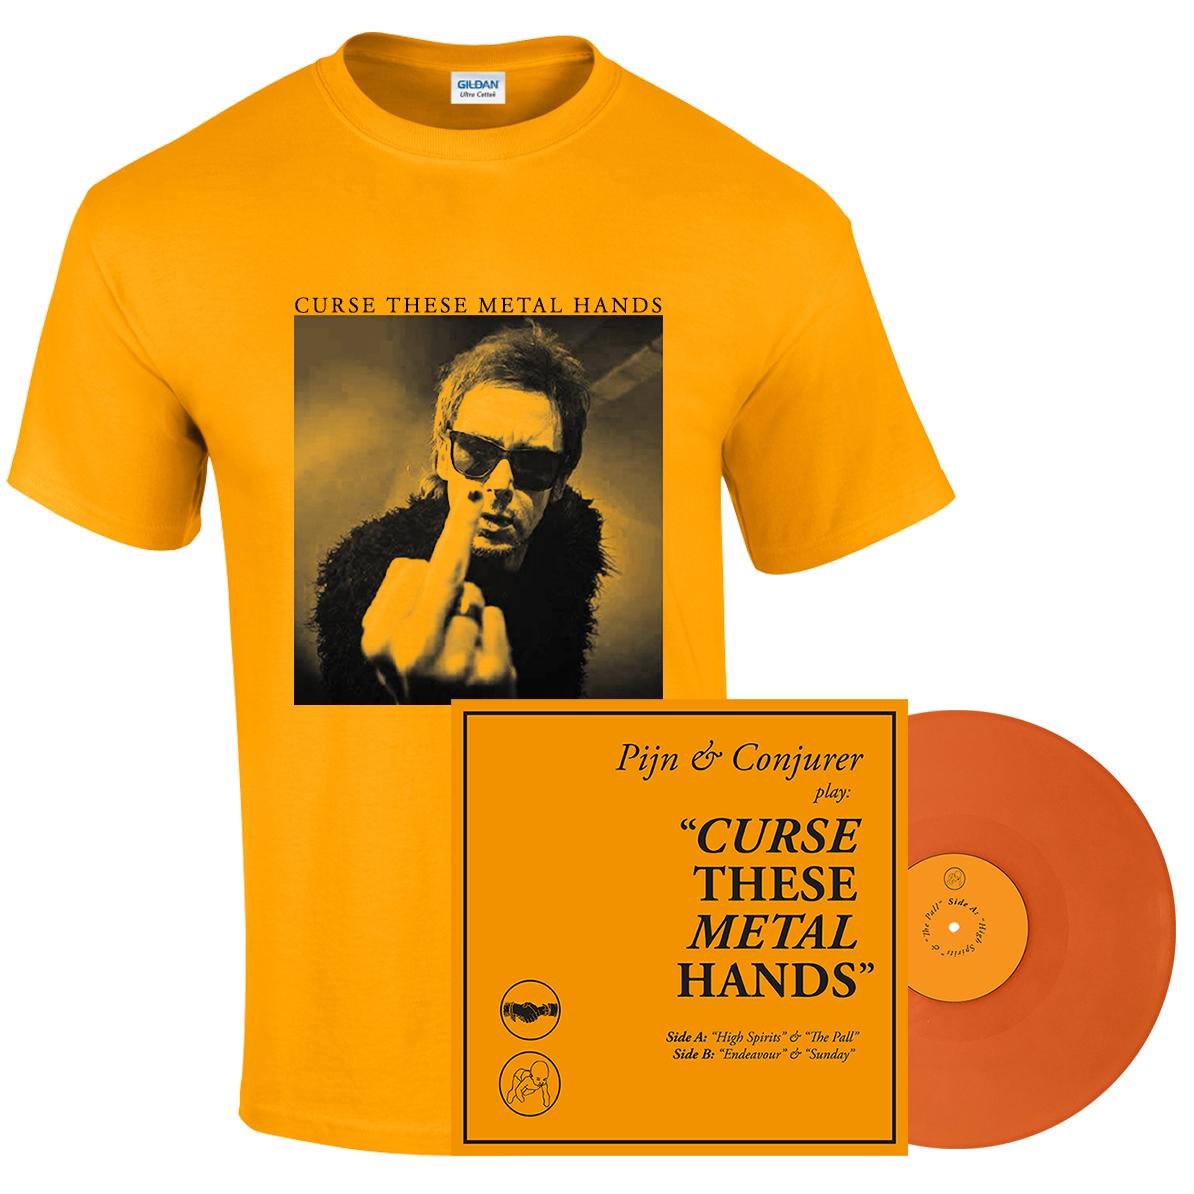 Pijn & Conjurer - Curse These Metal Hands shirt + LP PREORDER